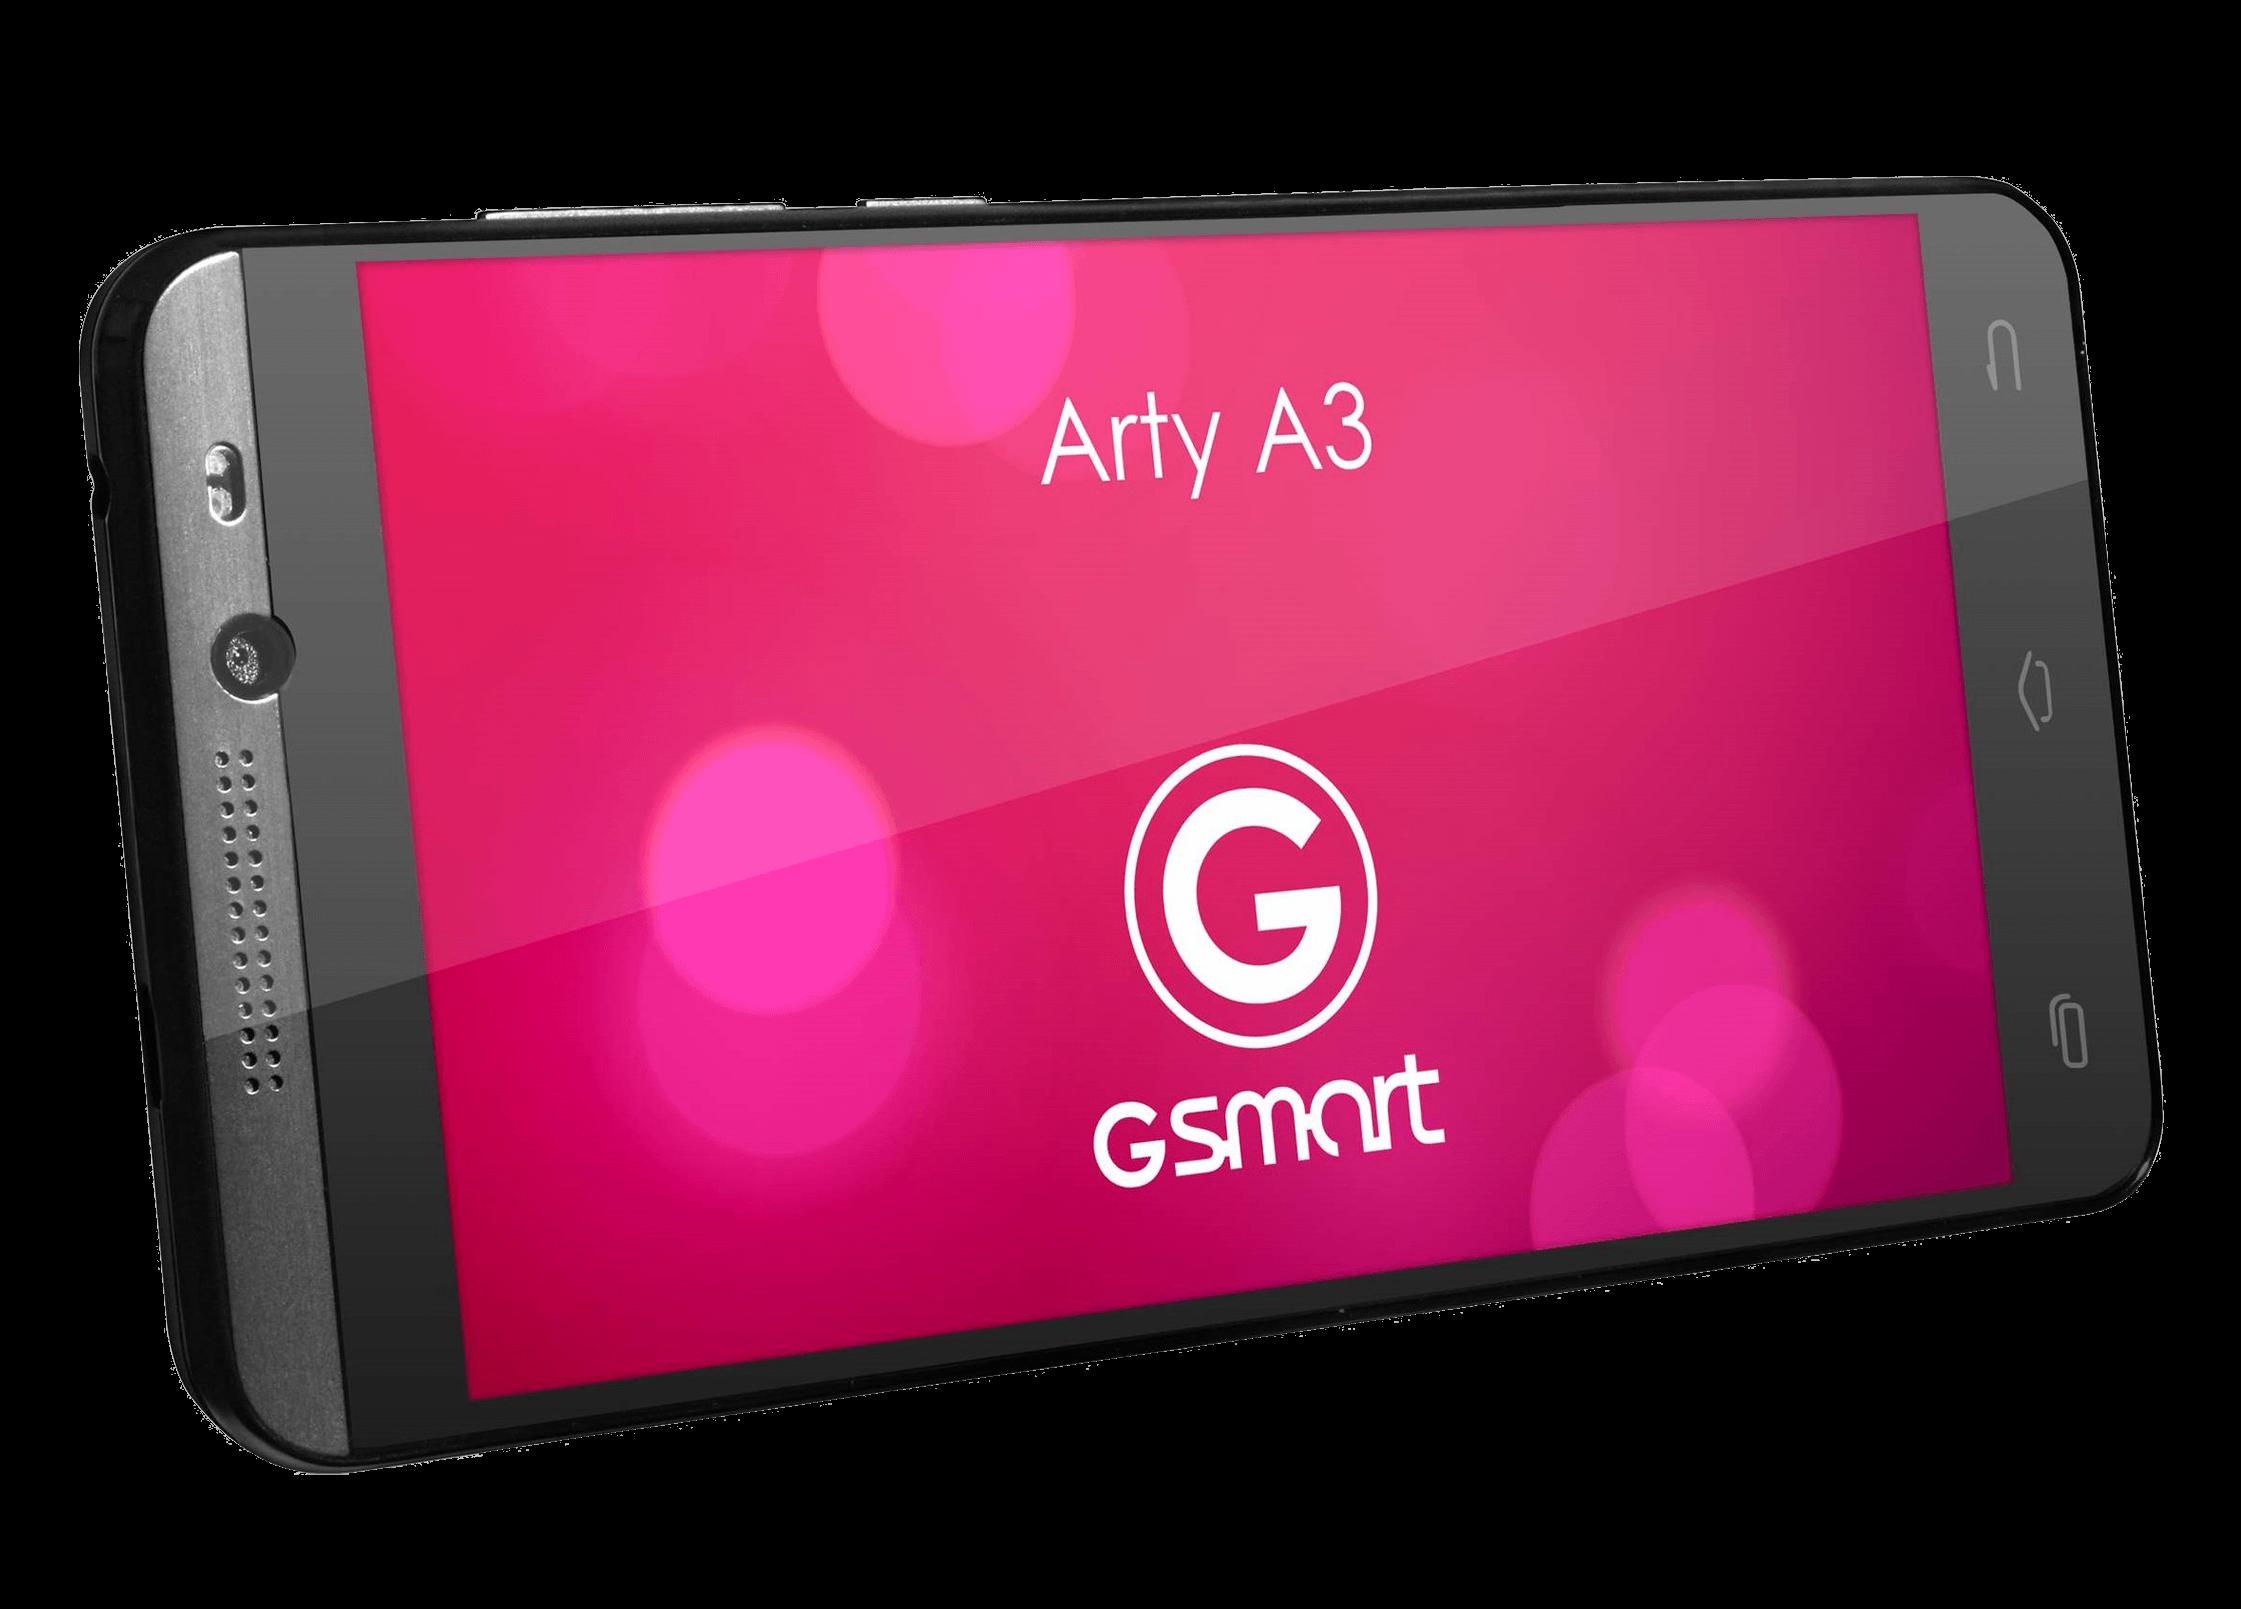 GIGABYTE GSmart Arty A3